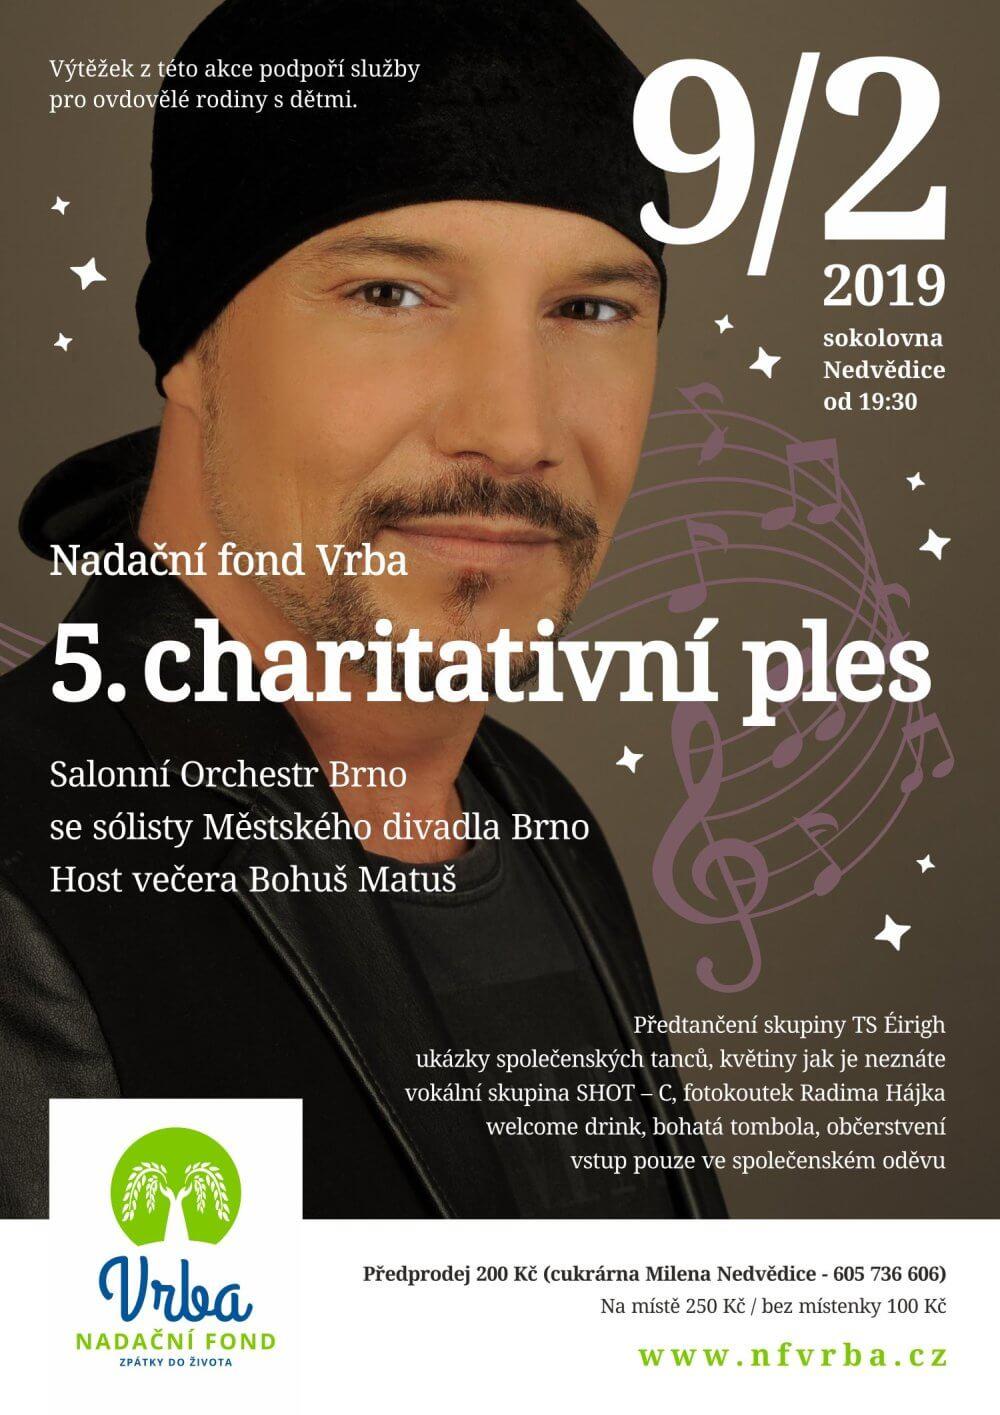 5. charitativní ples NF VRBA